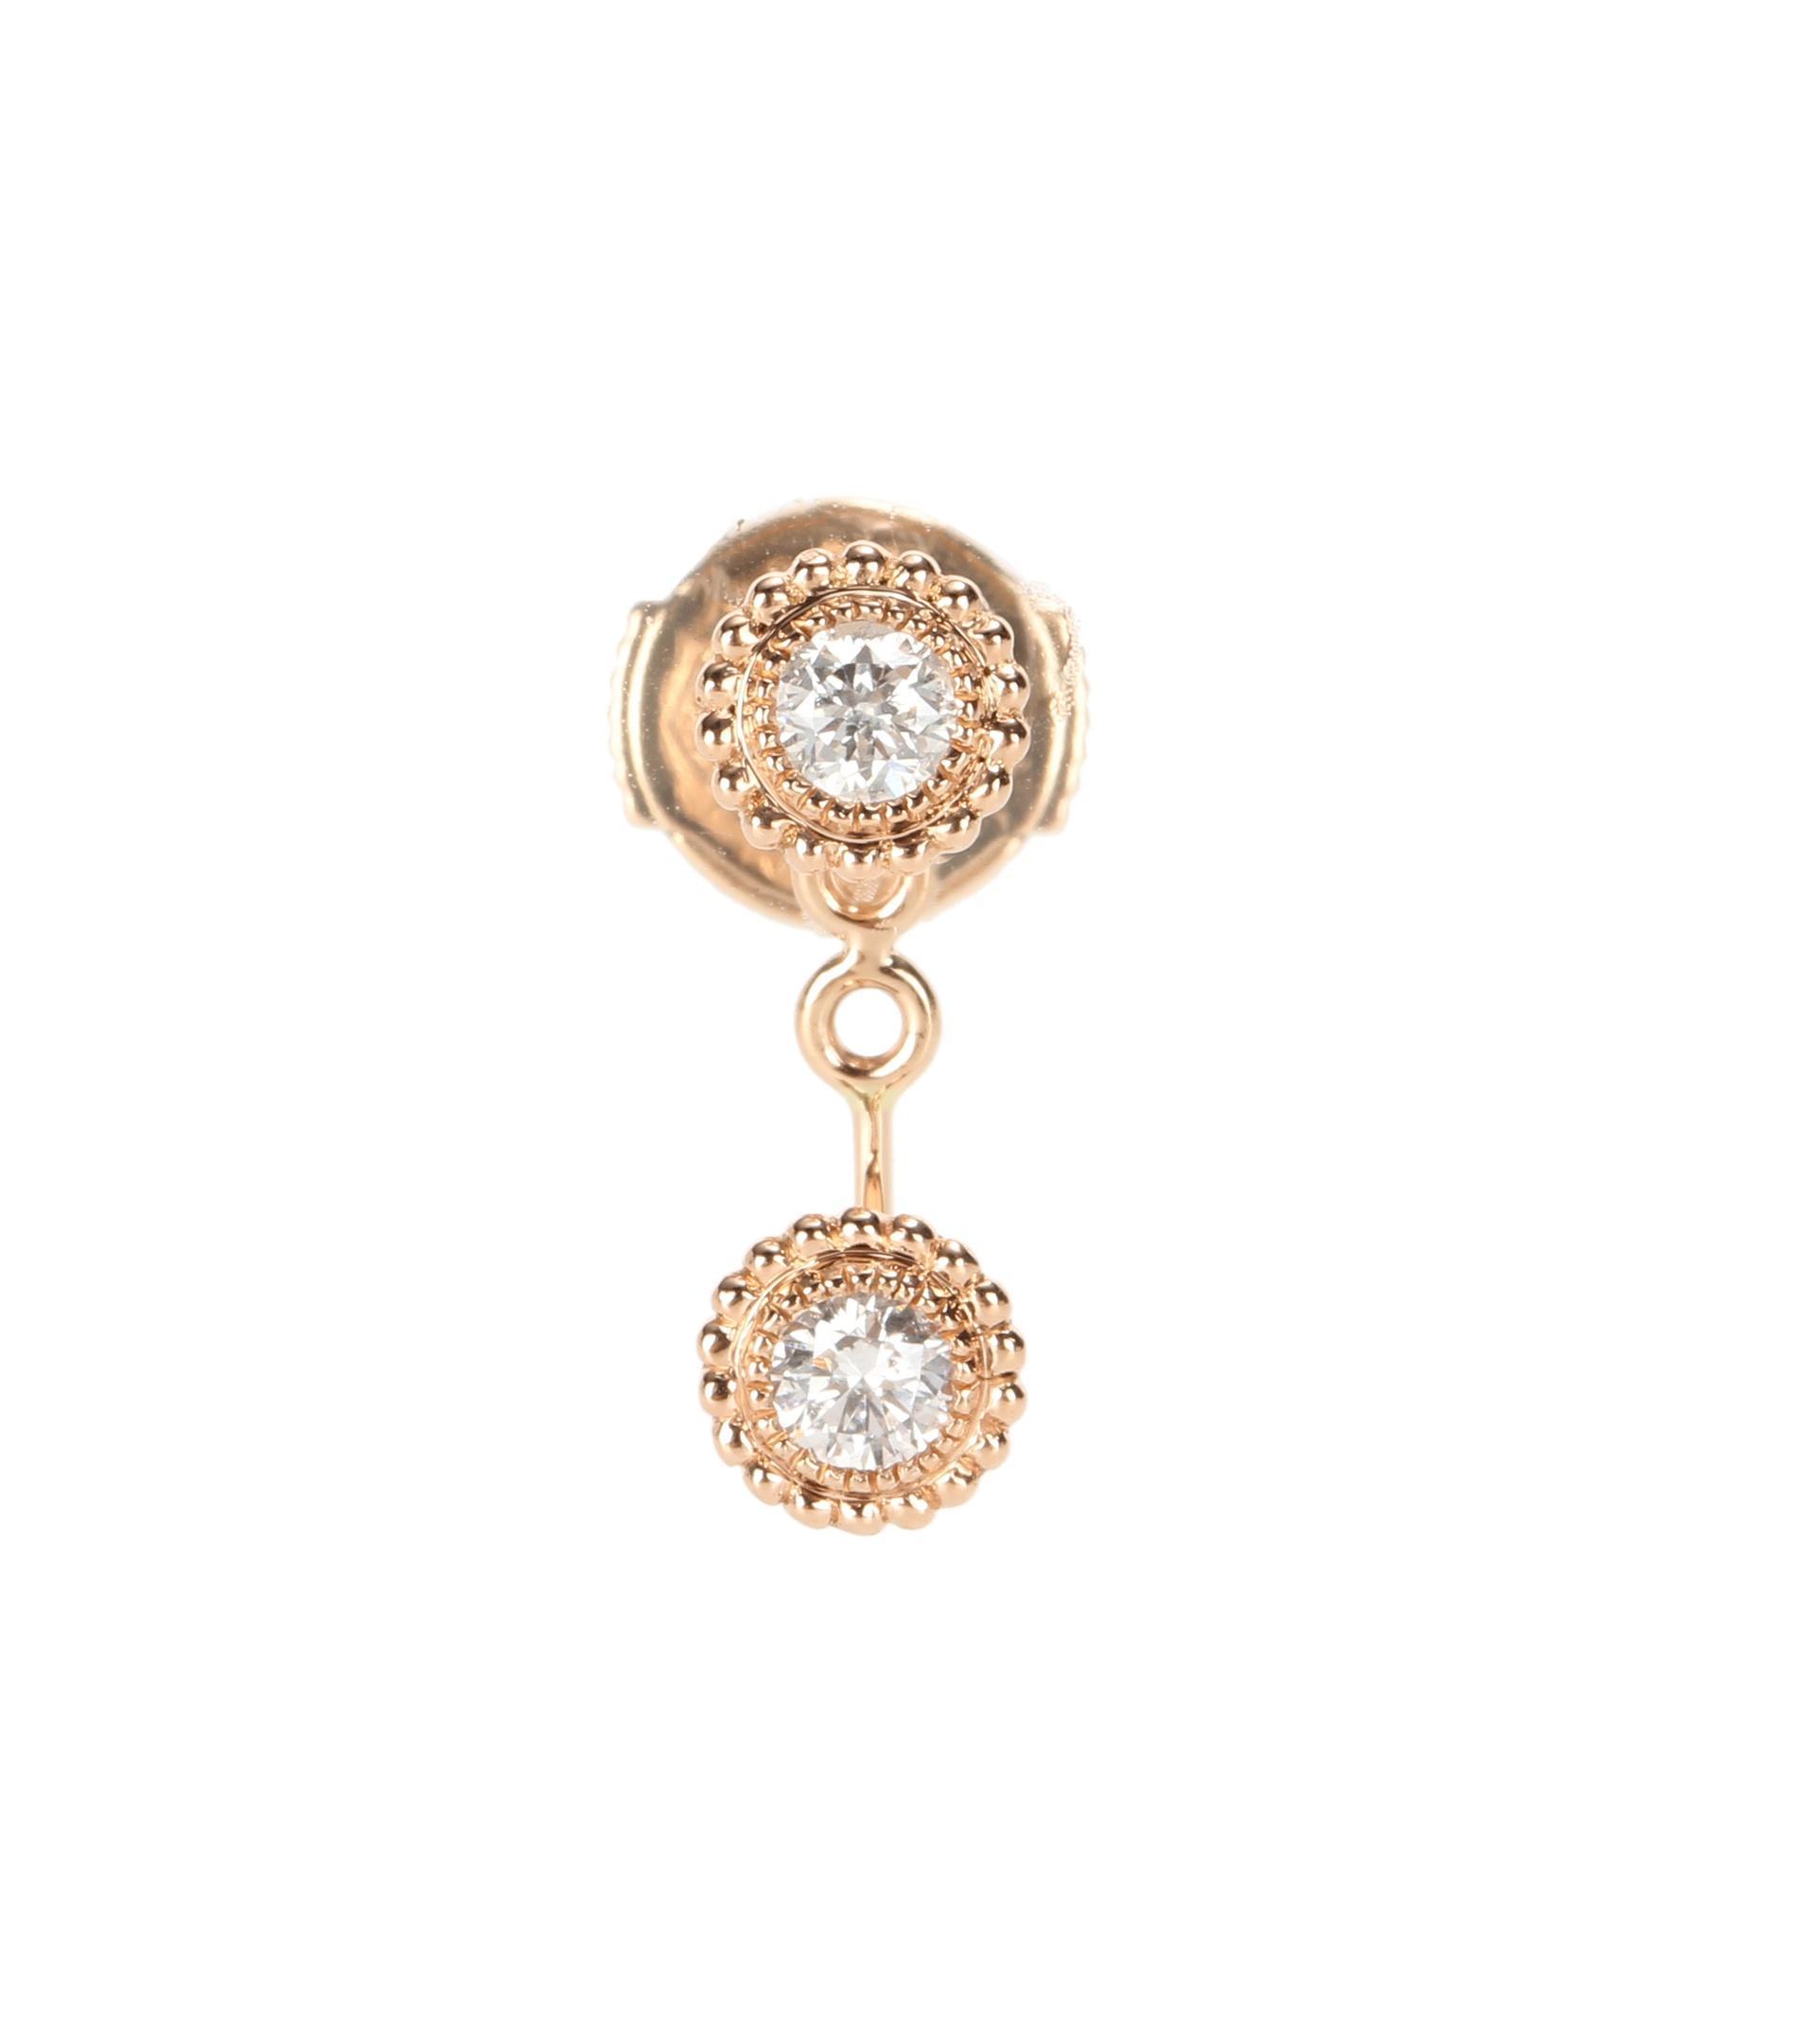 Stone Paris Swan Double Button 18kt rose gold earring with diamonds rpTC0iR7